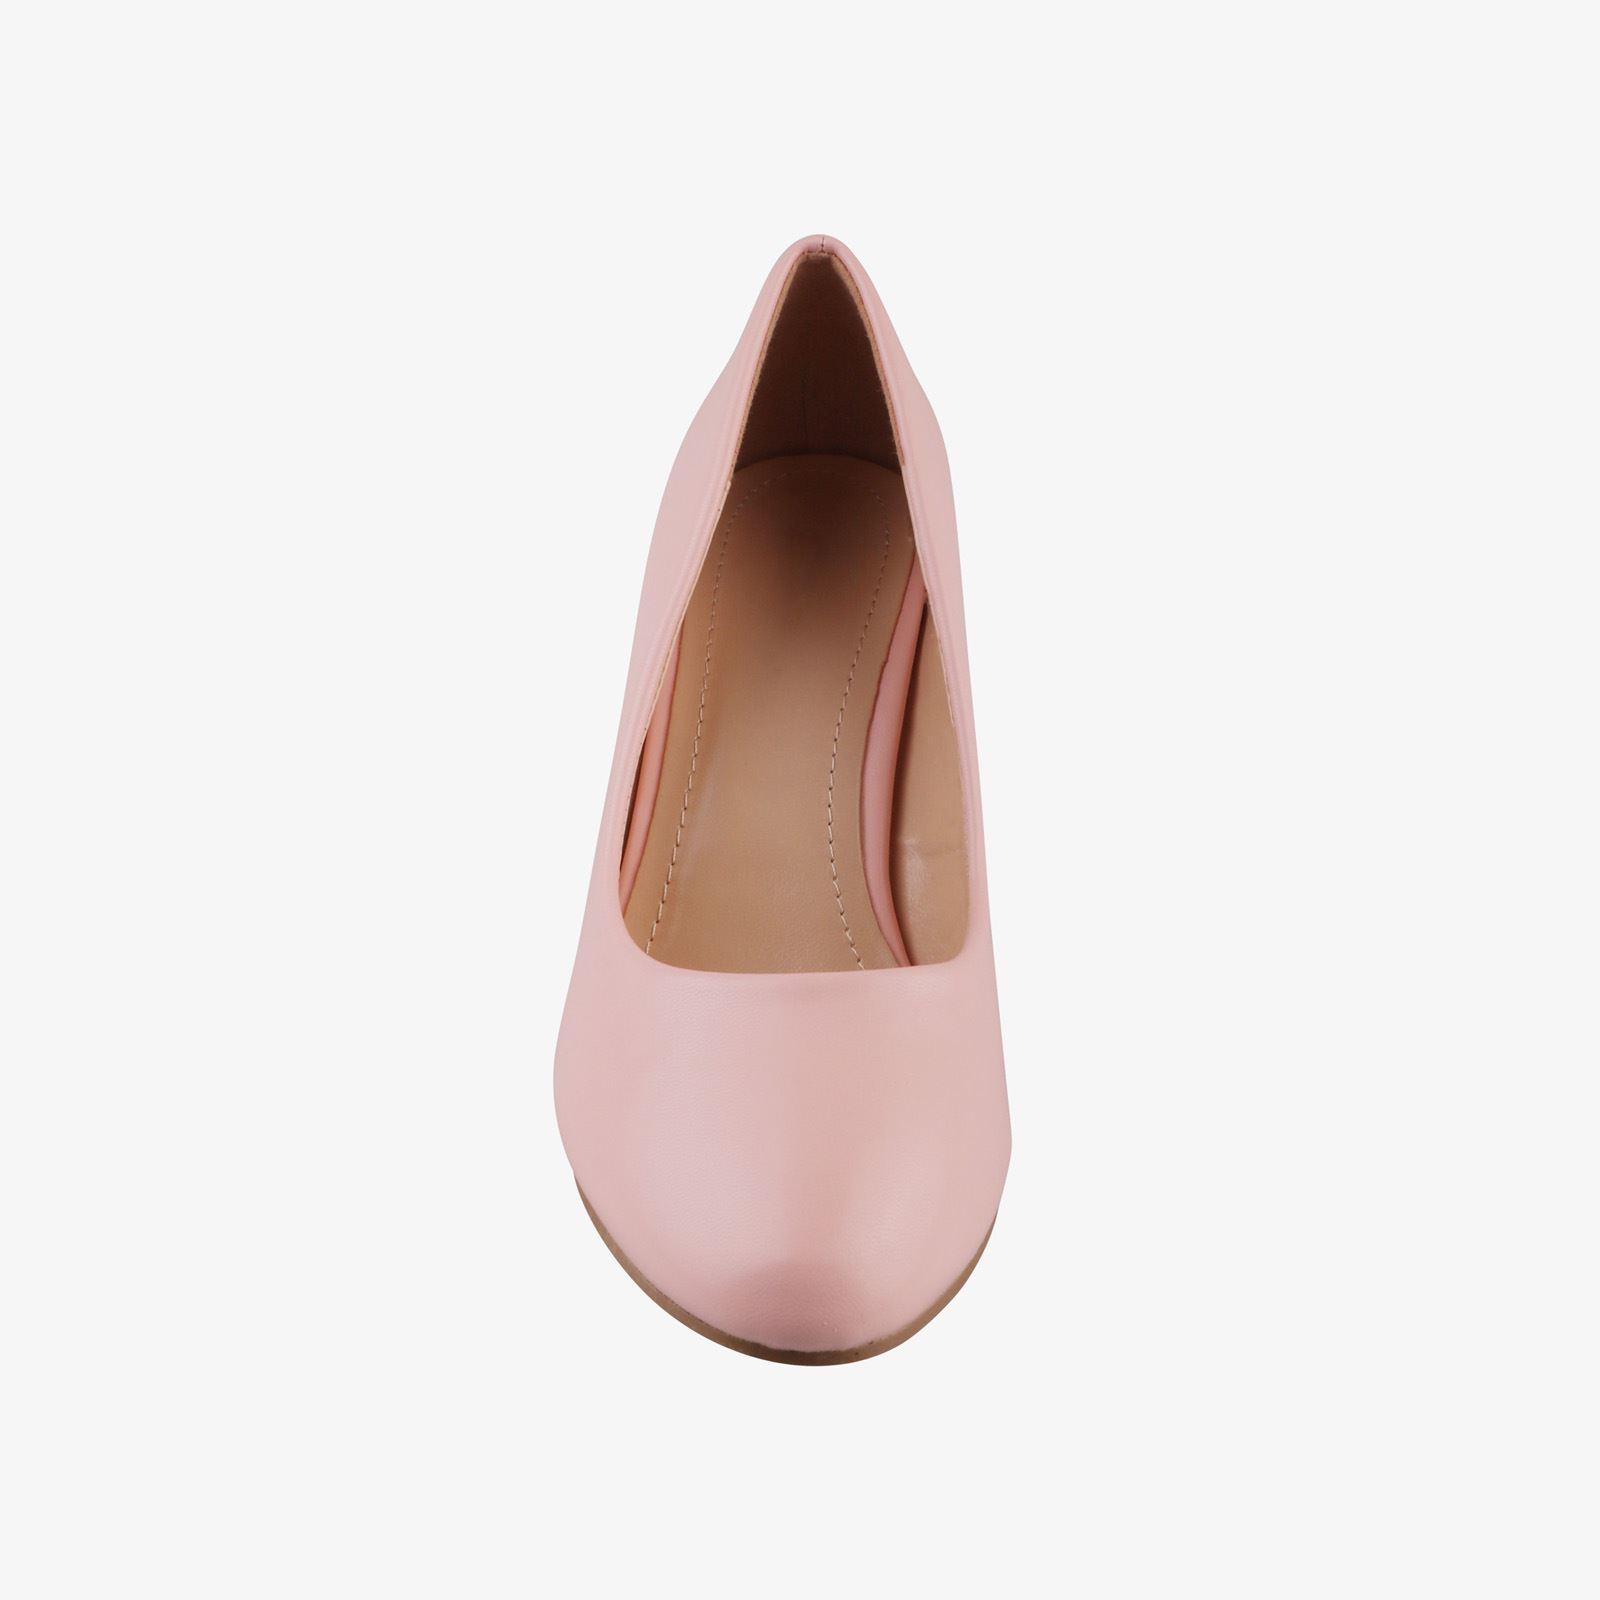 Womens-Ladies-Mid-Heel-Court-Shoes-Slip-On-Low-Kitten-Heels-Pumps-Matte-Size-3-8 thumbnail 19